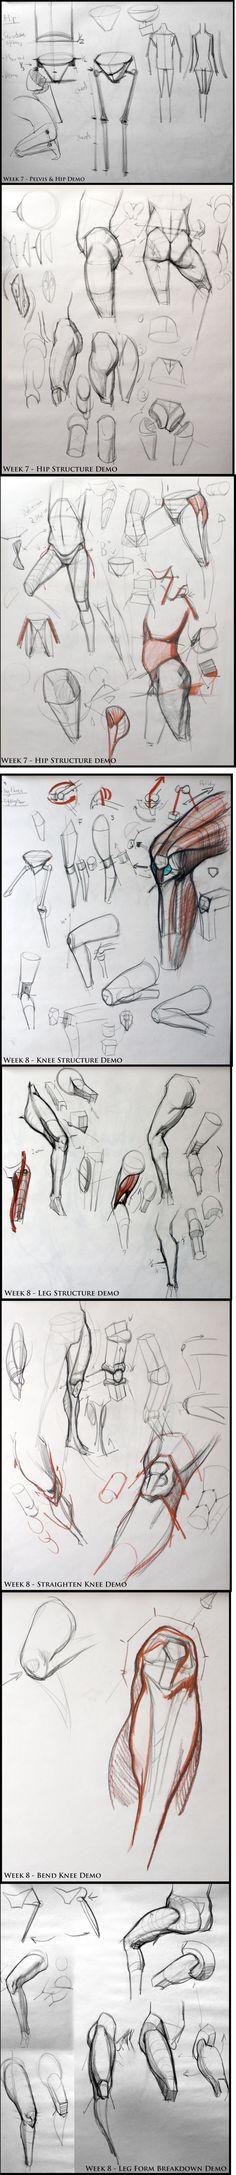 Pelvis & hip structure / Leg & knee - analyticalfiguresp08.blogspot - Kevin Chen #analytical #drawing #figureDrawing #instructorDemo #structure